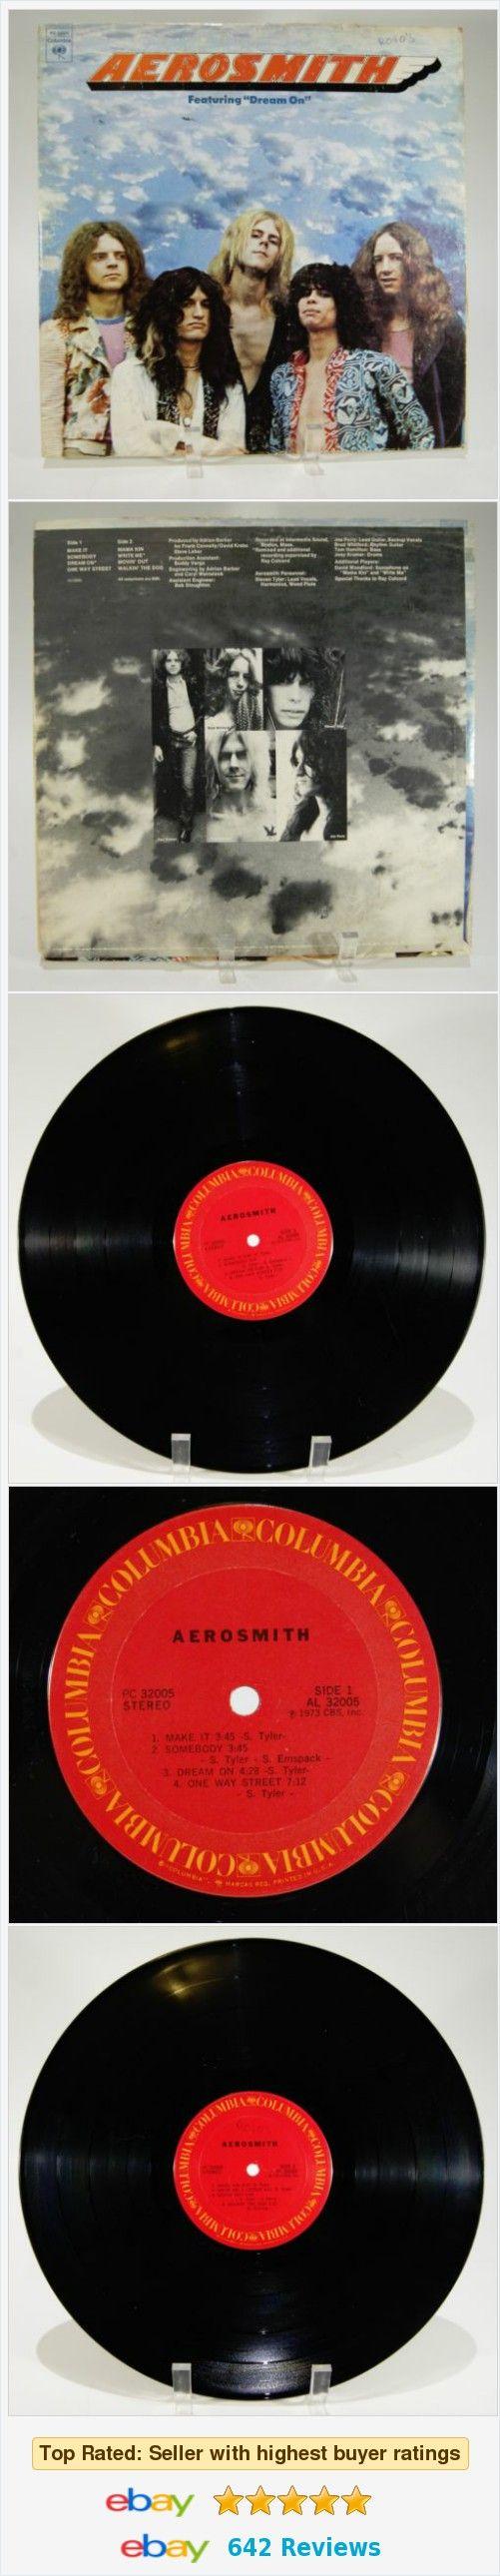 Aerosmith- Aerosmith Album LP Vinyl Record 1976 PC32005 Columbia Vintage  | eBay